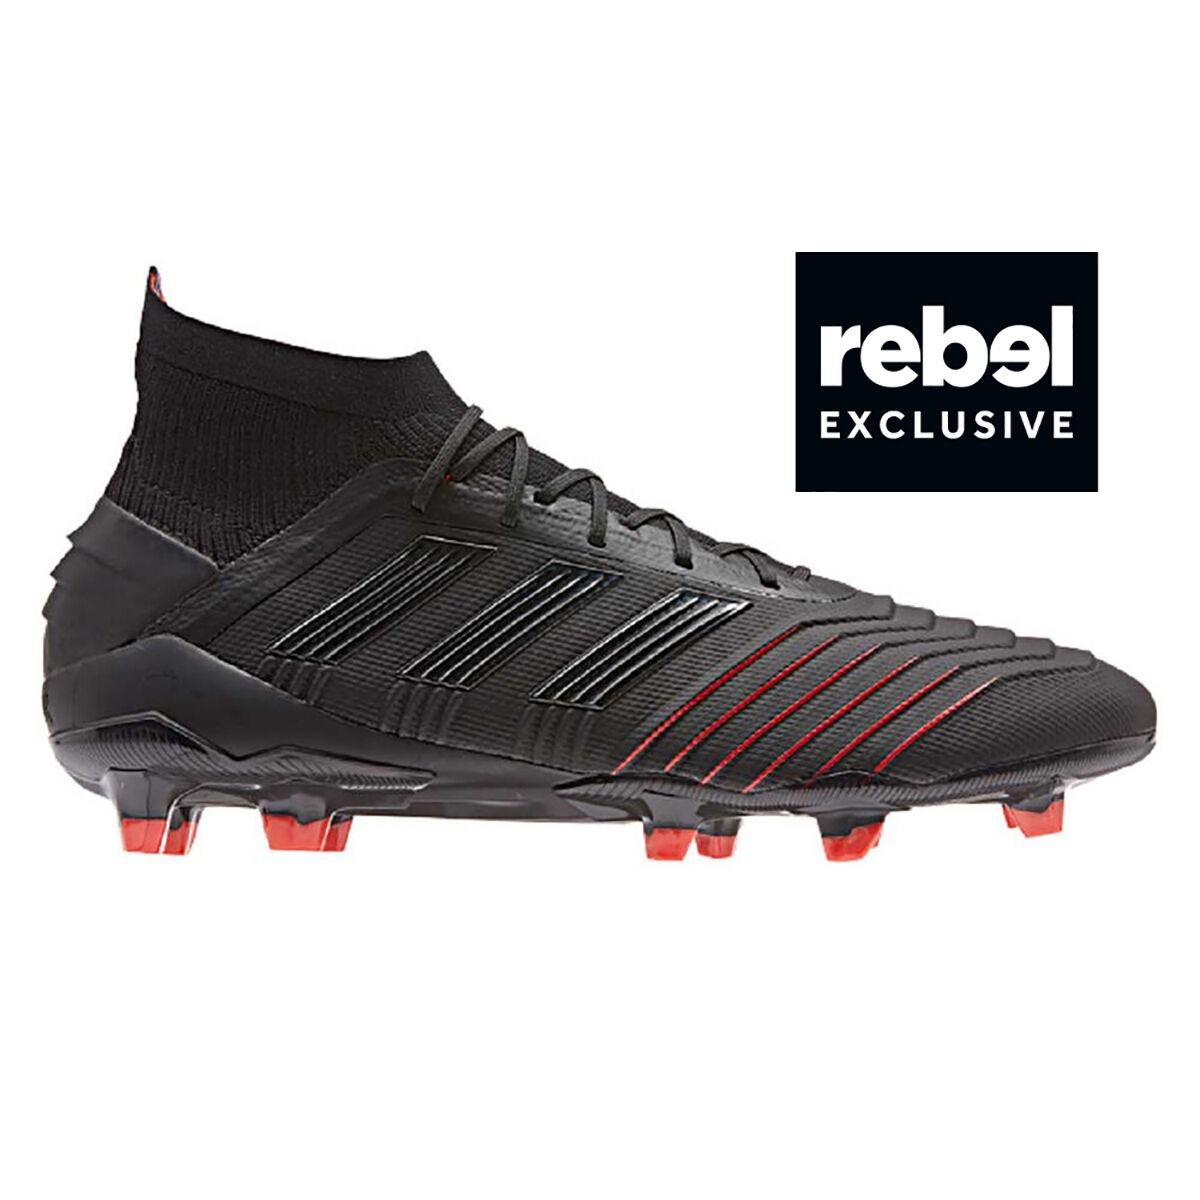 adidas Predator 19.1 Mens Football